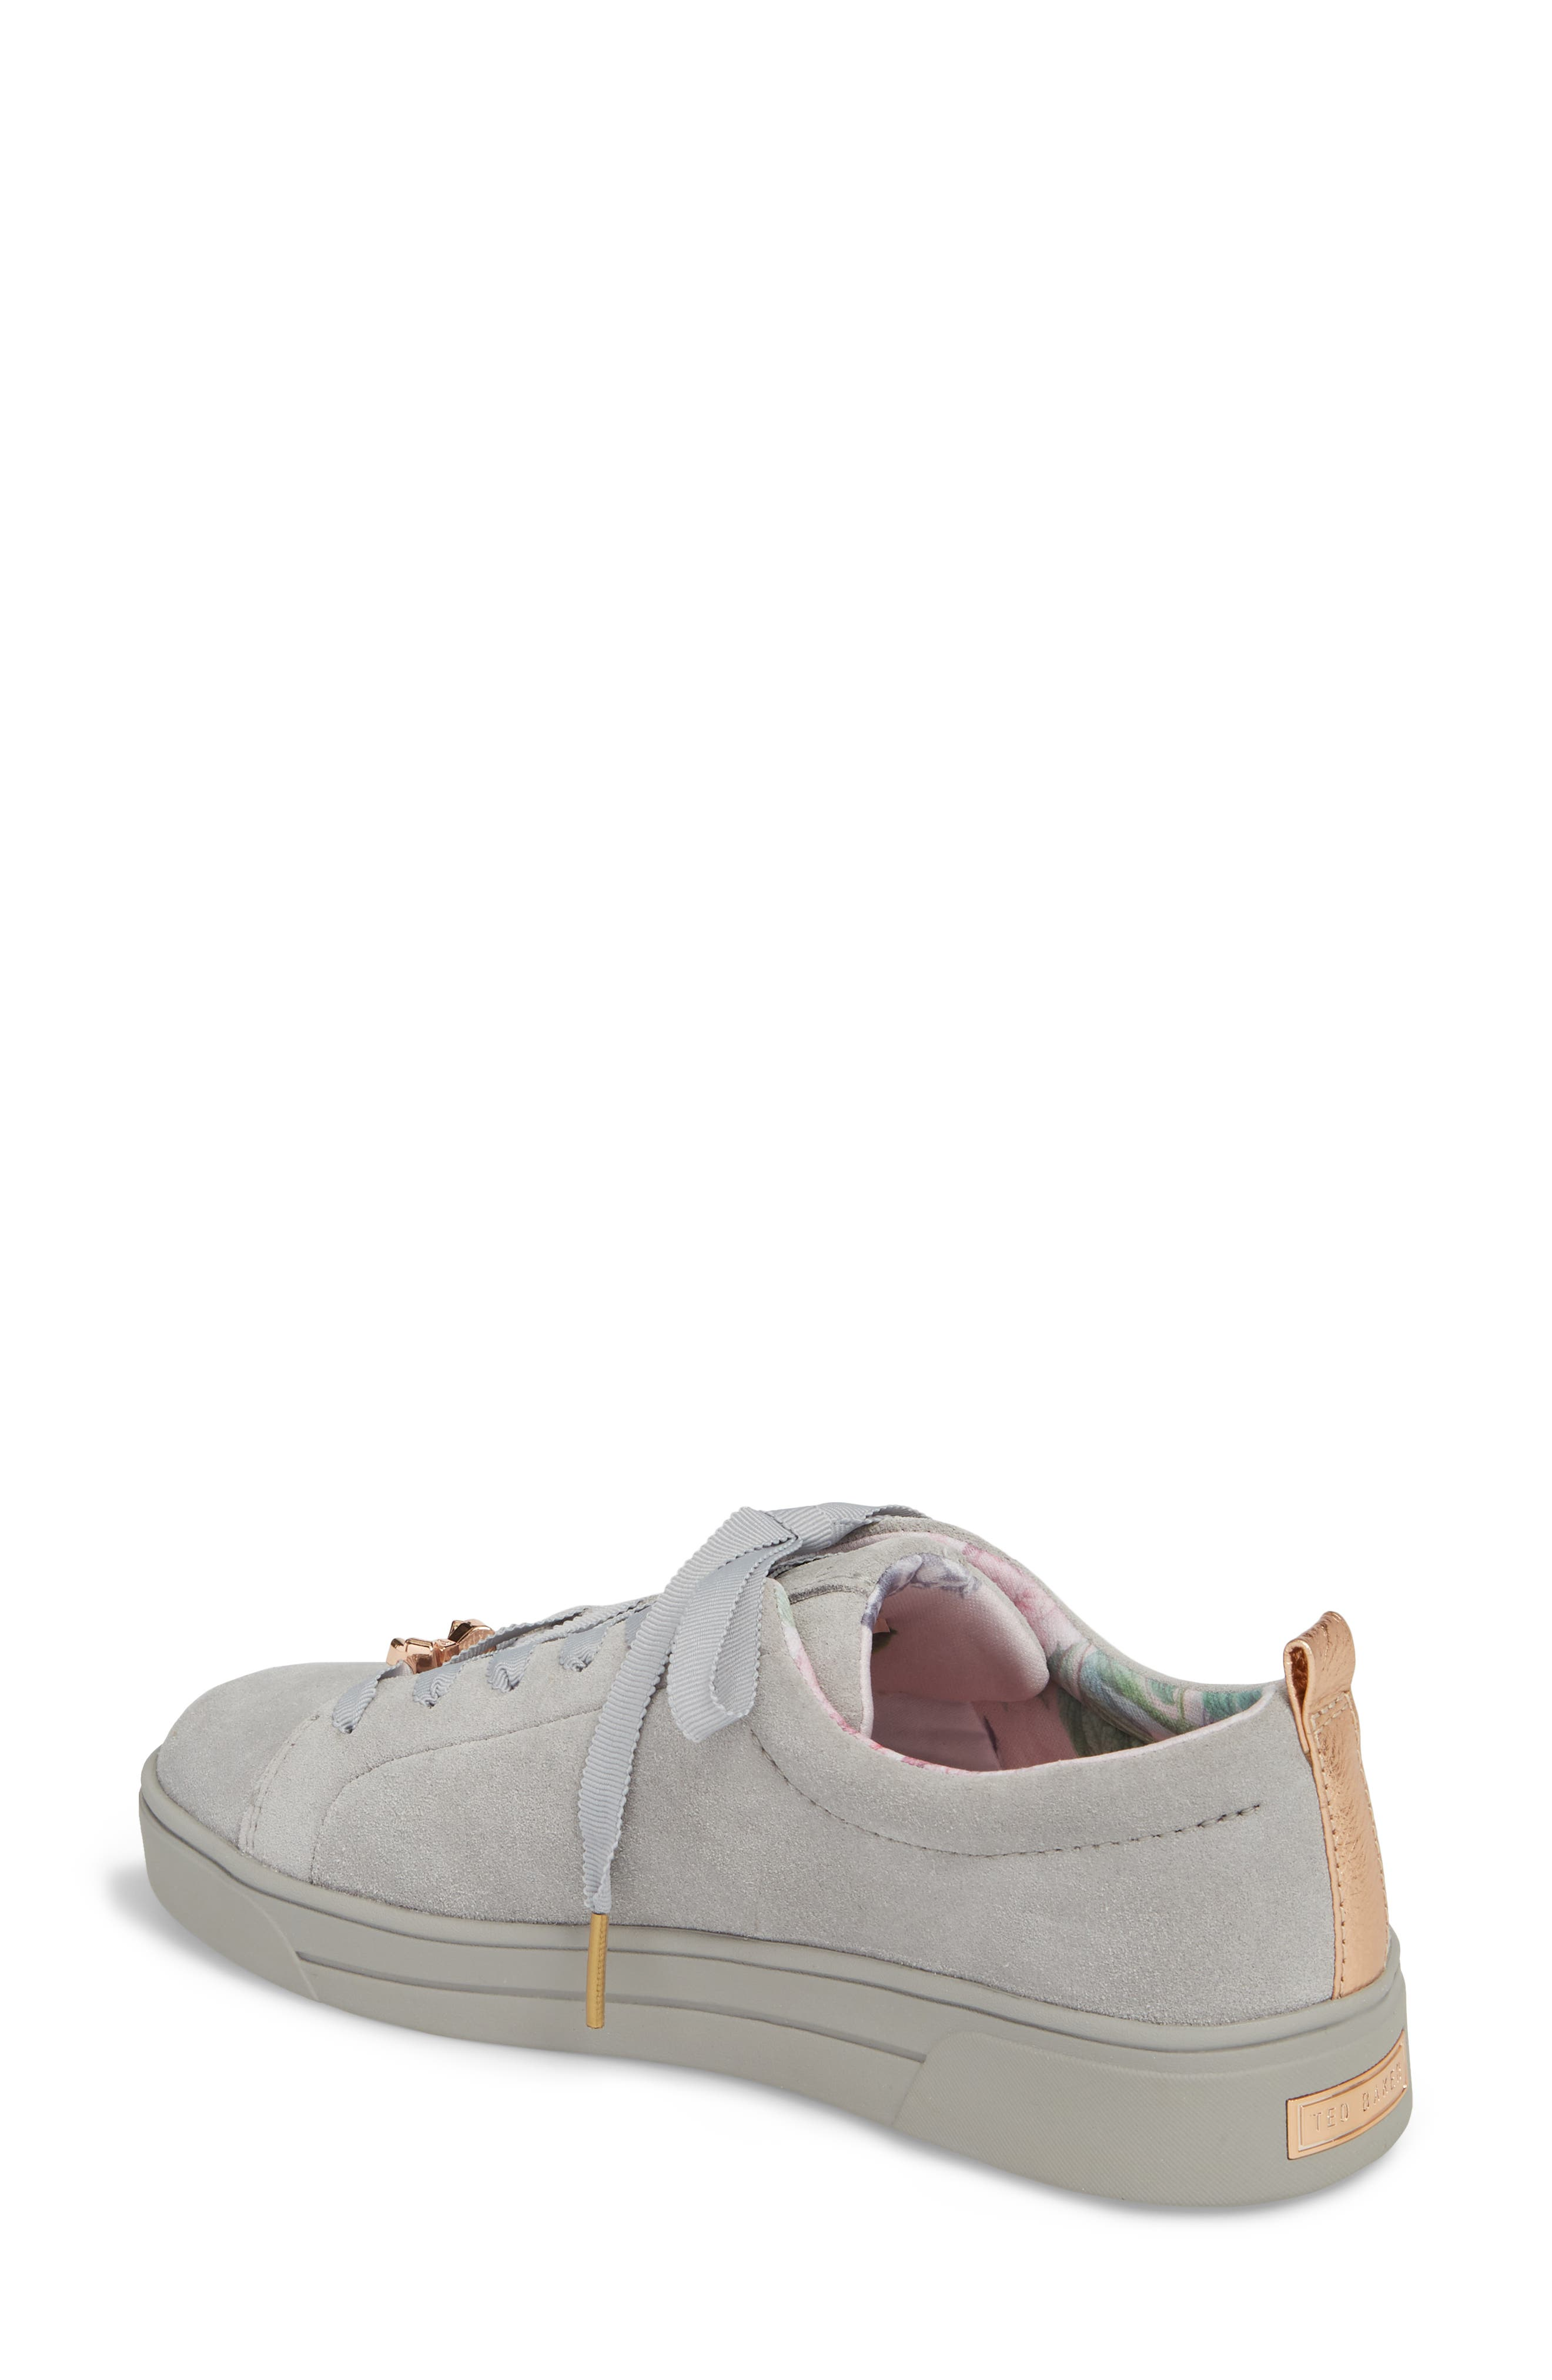 Kelleis Sneaker,                             Alternate thumbnail 2, color,                             052